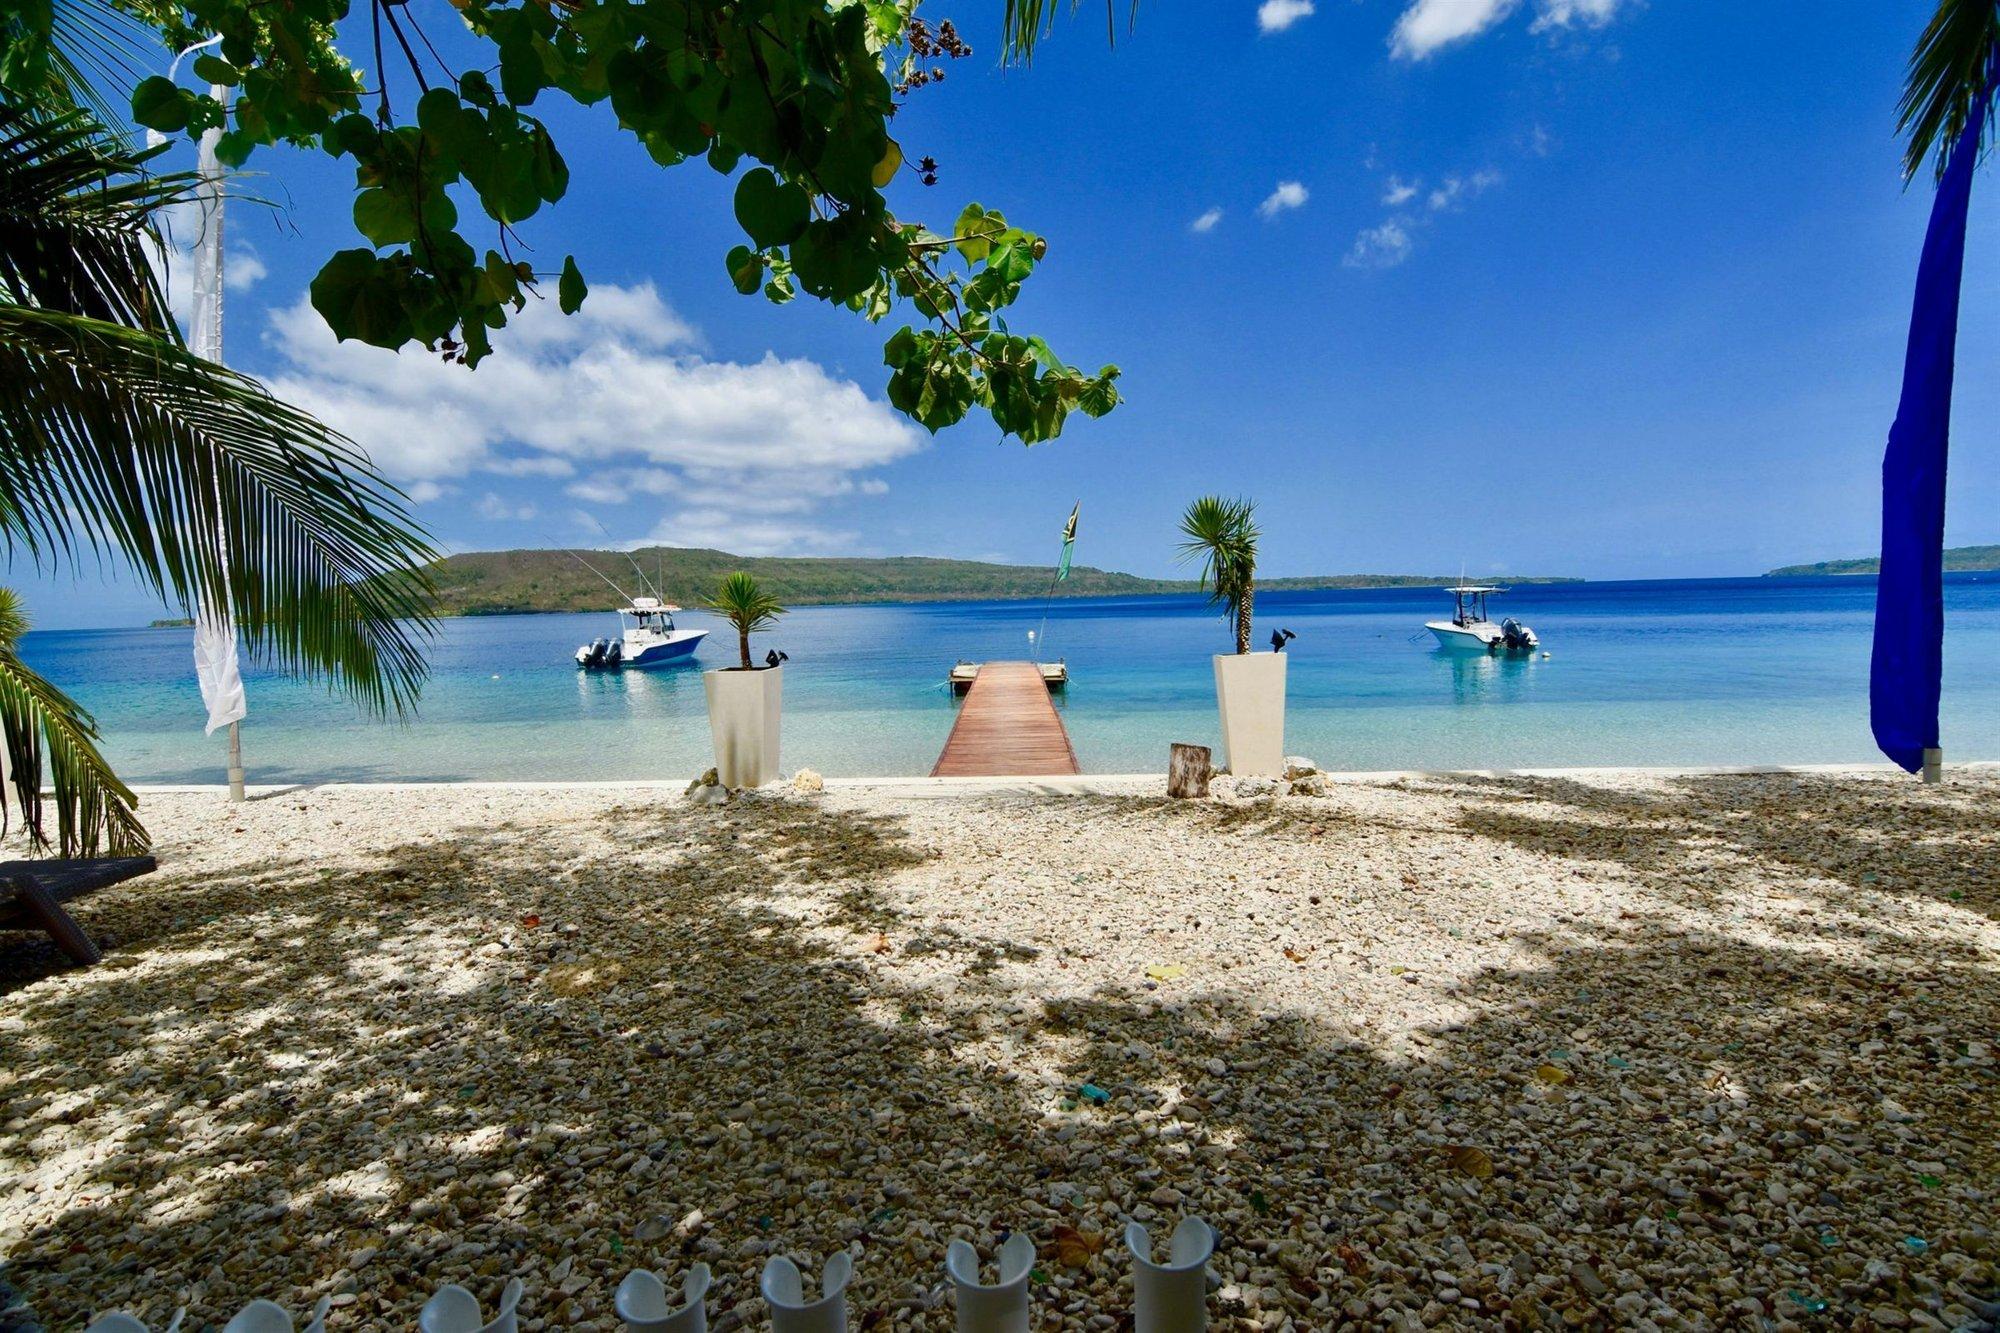 House in Papeari, Windward Islands, French Polynesia 1